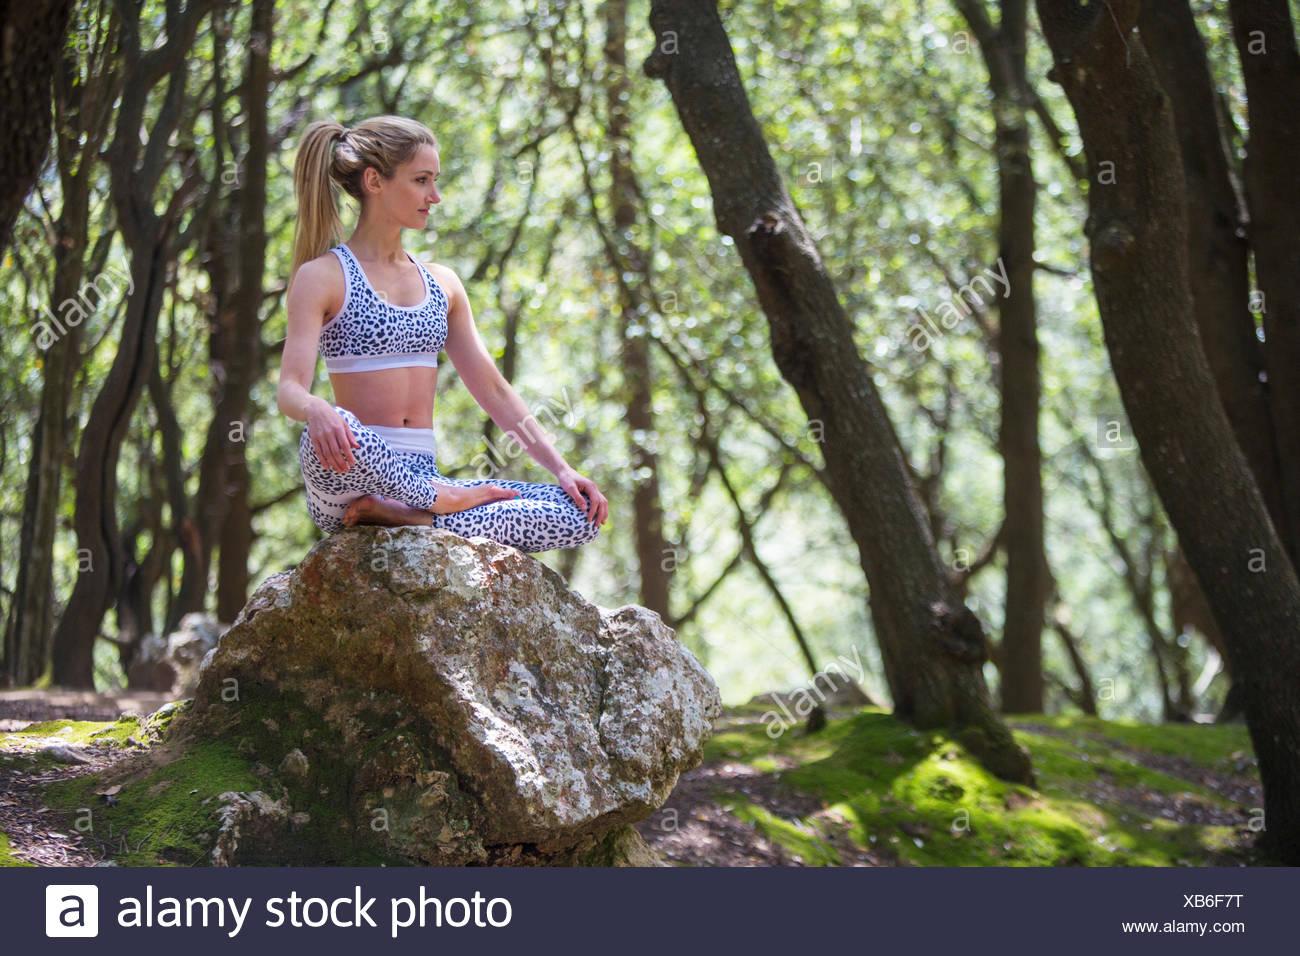 Woman on rock sitting cross legged meditating - Stock Image